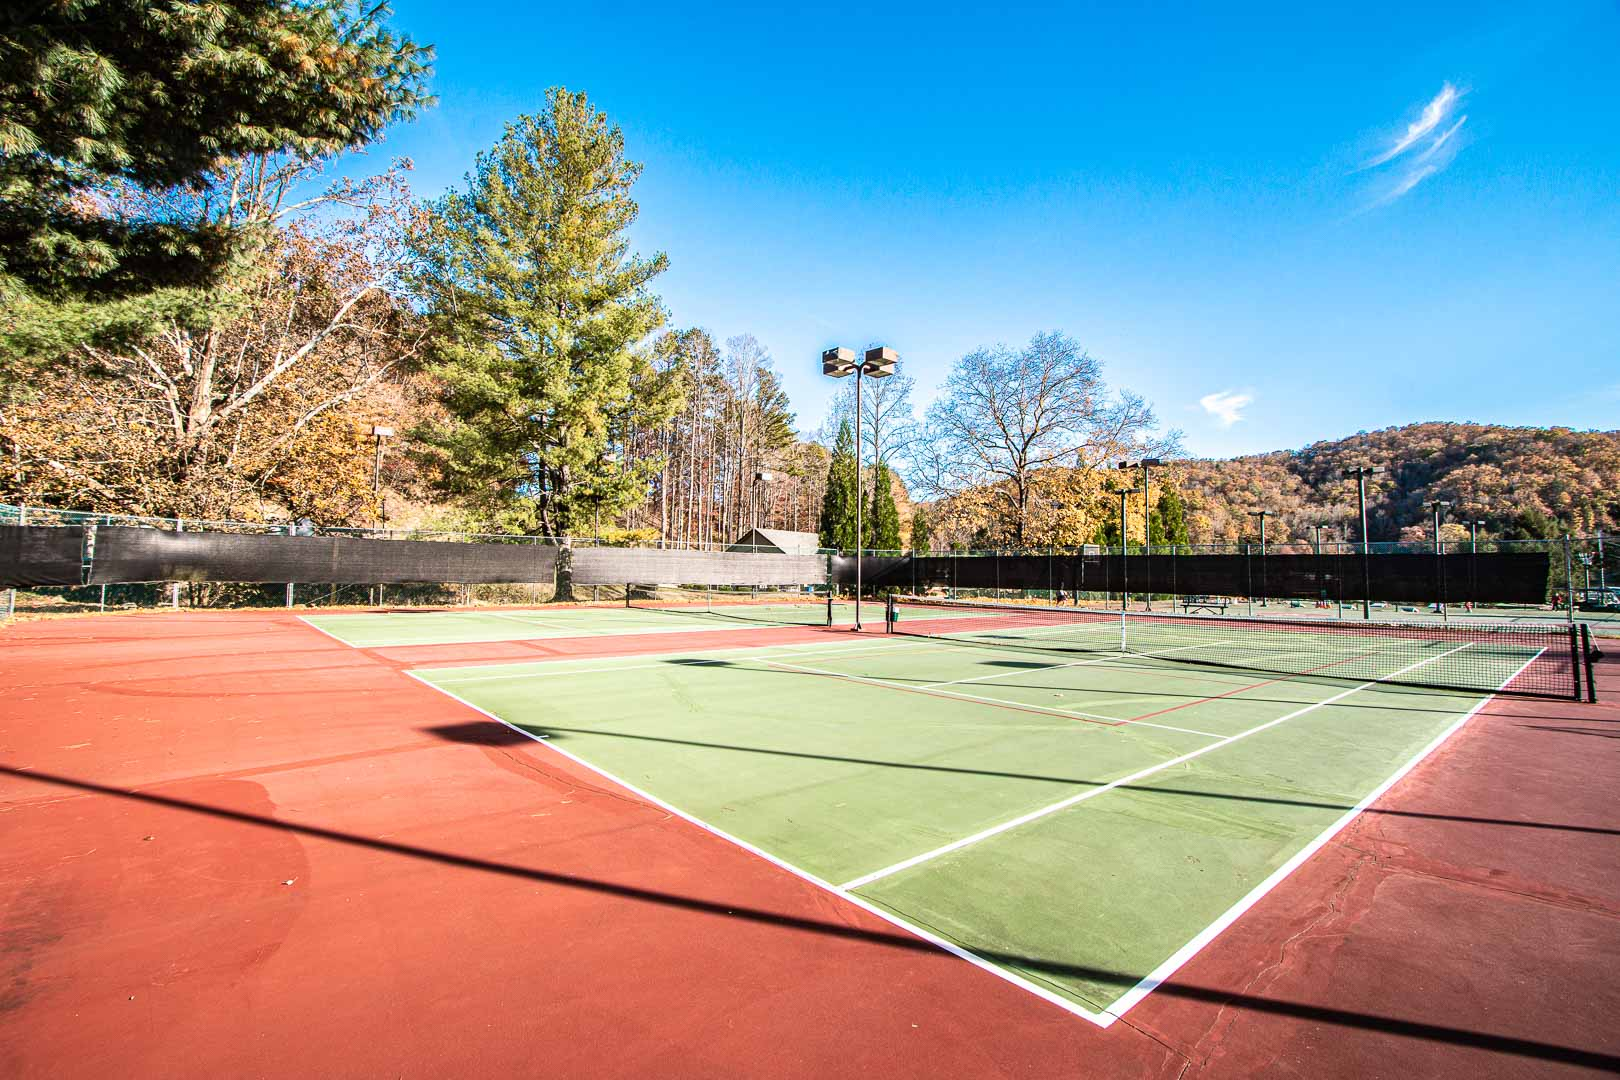 Outdoor tennis courts at VRI's Fox Run Resort in North Carolina.